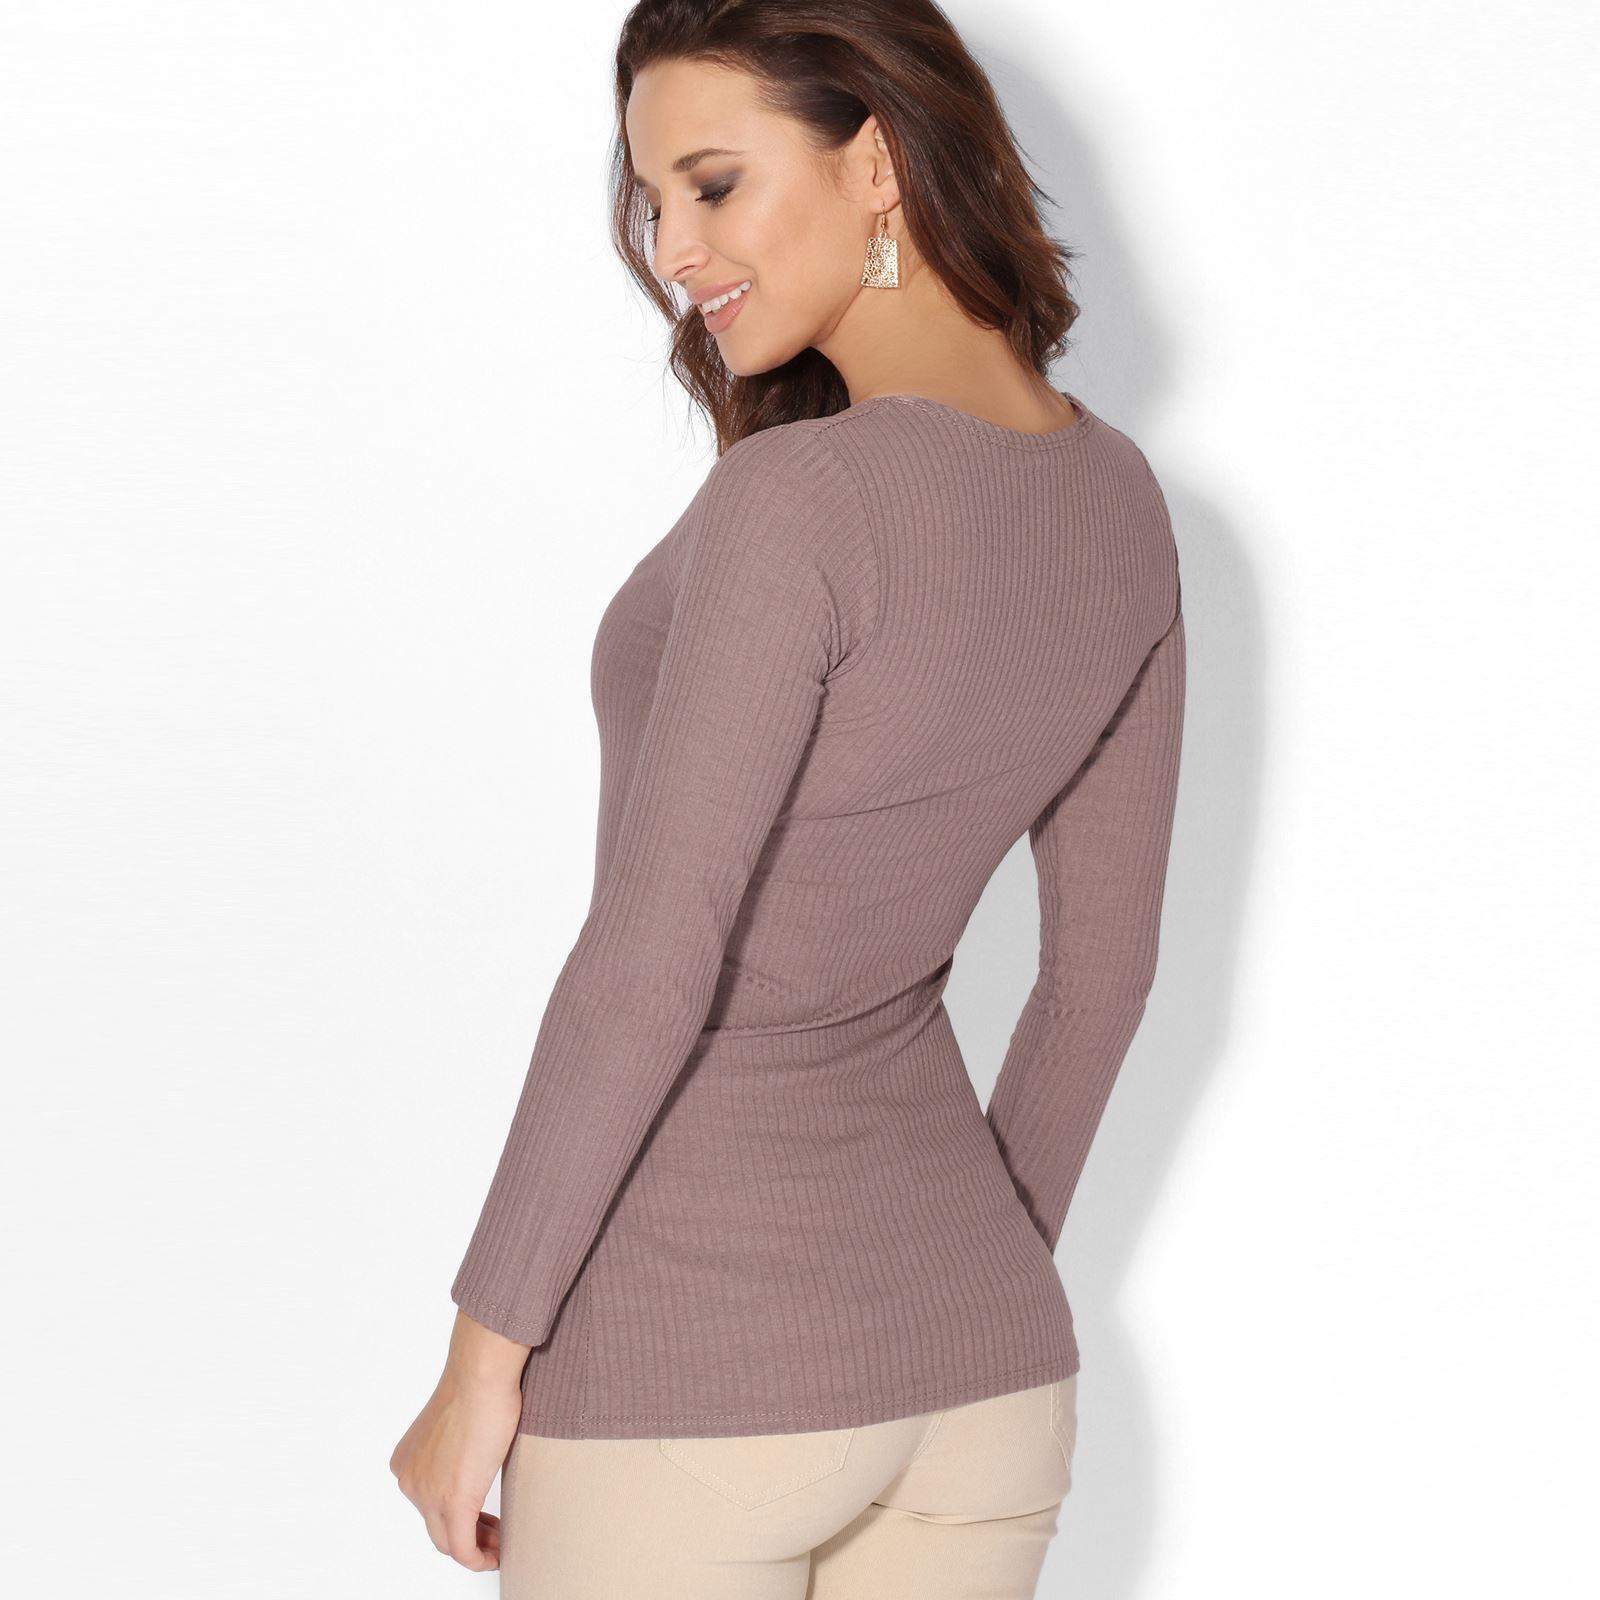 Rebeca-Mujer-Corta-Botones-Basica-Acanalada-Barata-Oferta-Casual-Ligera-Fina miniatura 20